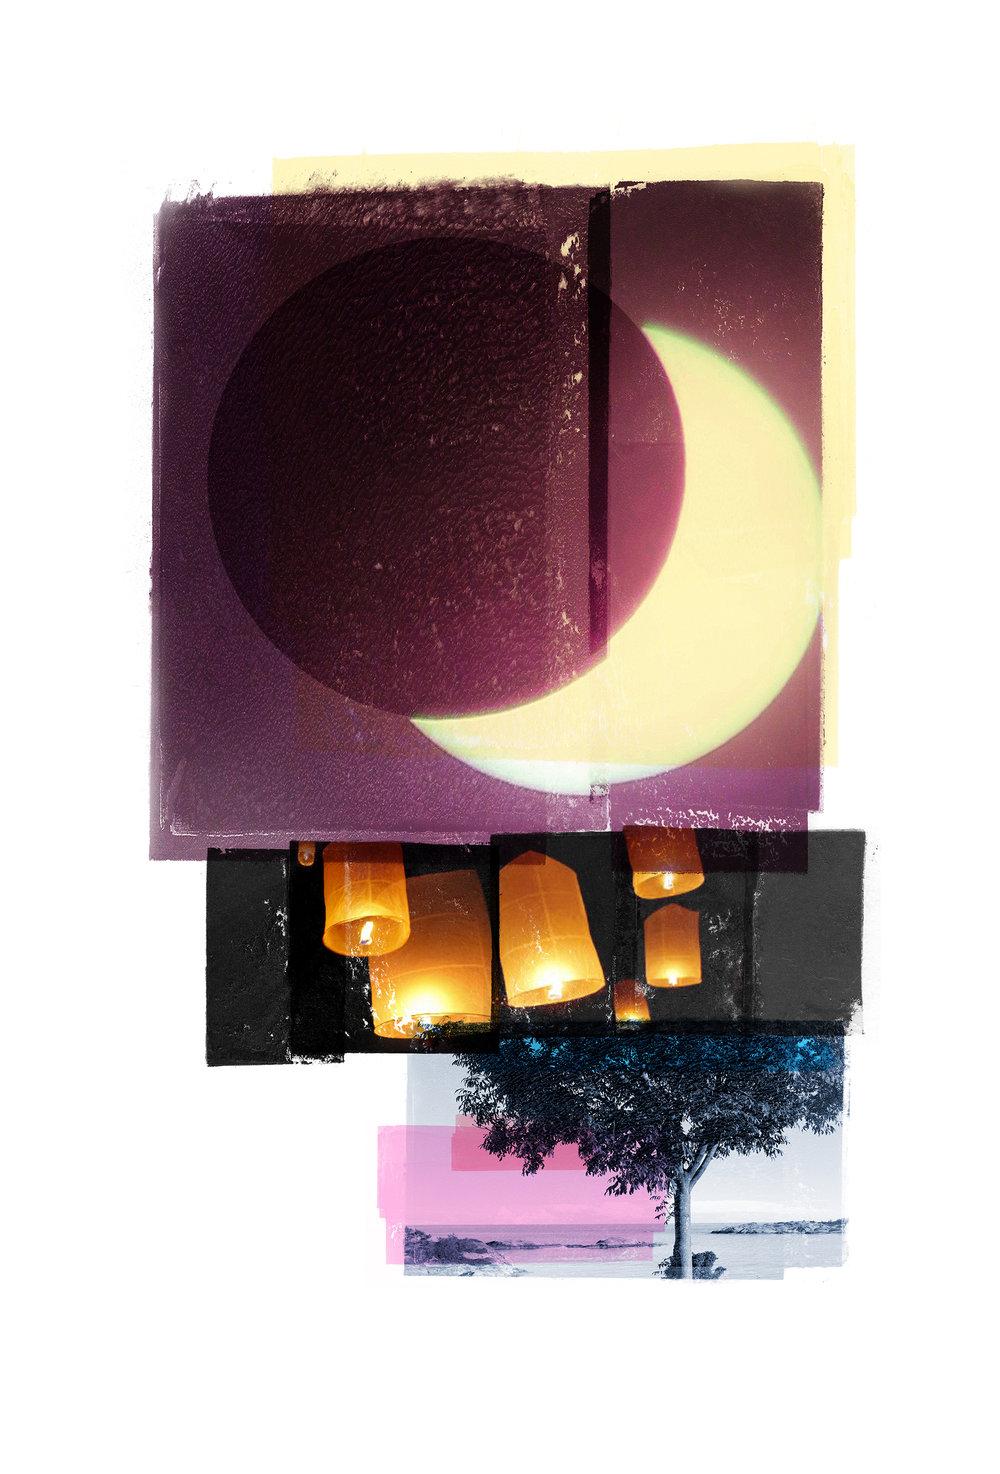 Wishlist / Eclipse   Original Archival UV Pigment Print / BFK Rives 250 gr 35 x 56 cm / 22 x 13,7 in Edition of 50 + 7 Ap Editeur: Per Fronth Studios / Printer Henrik Aunevik  05/2016: